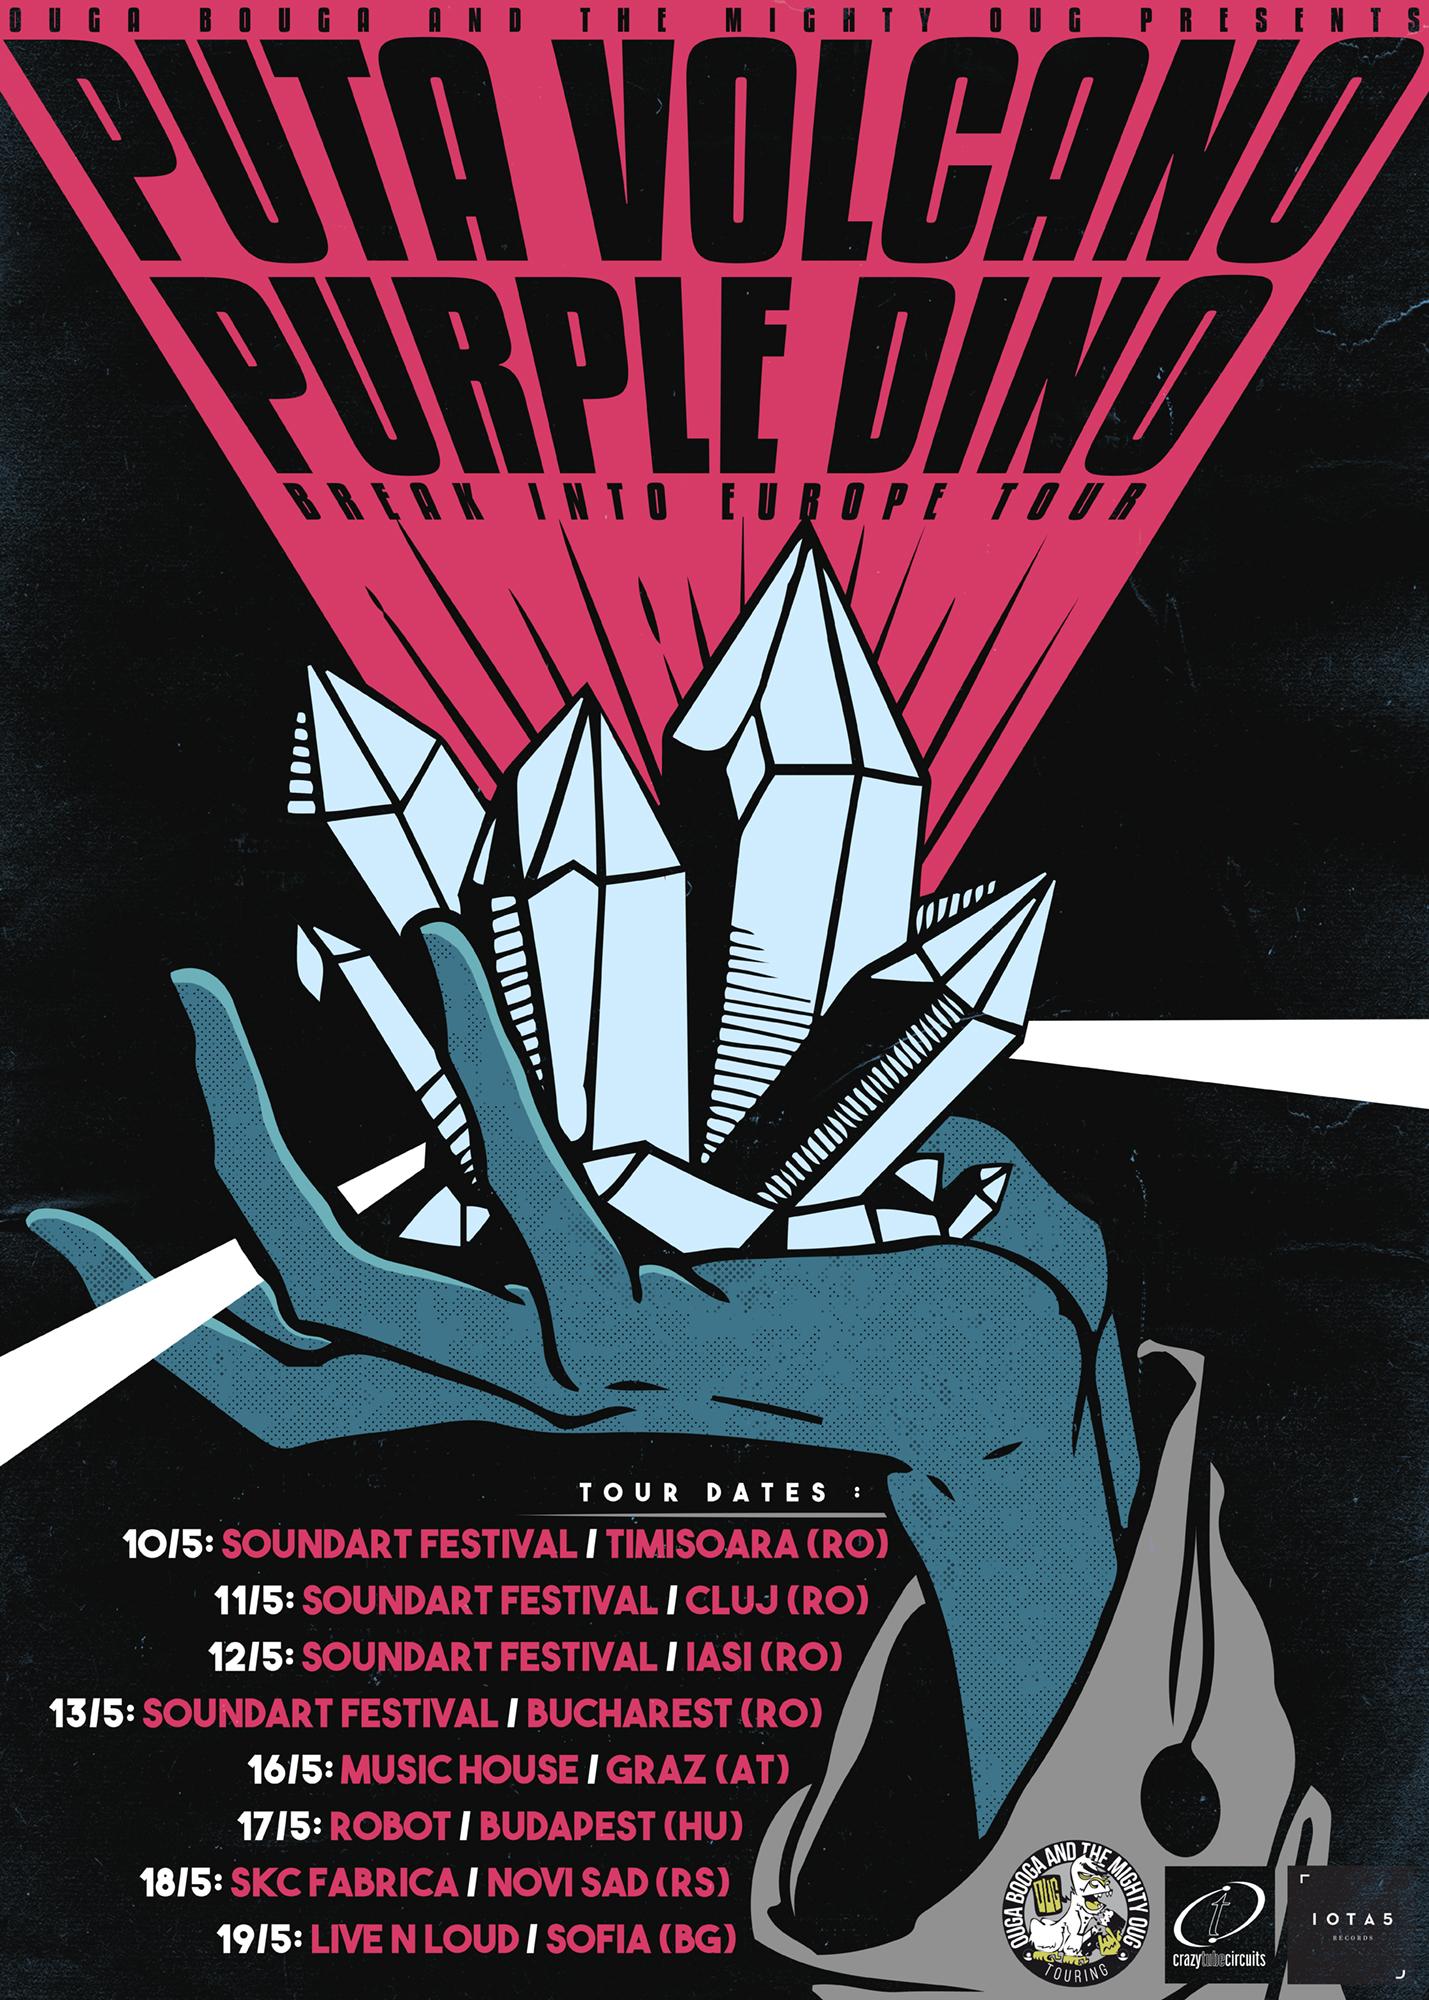 Puta Volcano + Purple Dino Tour Poster